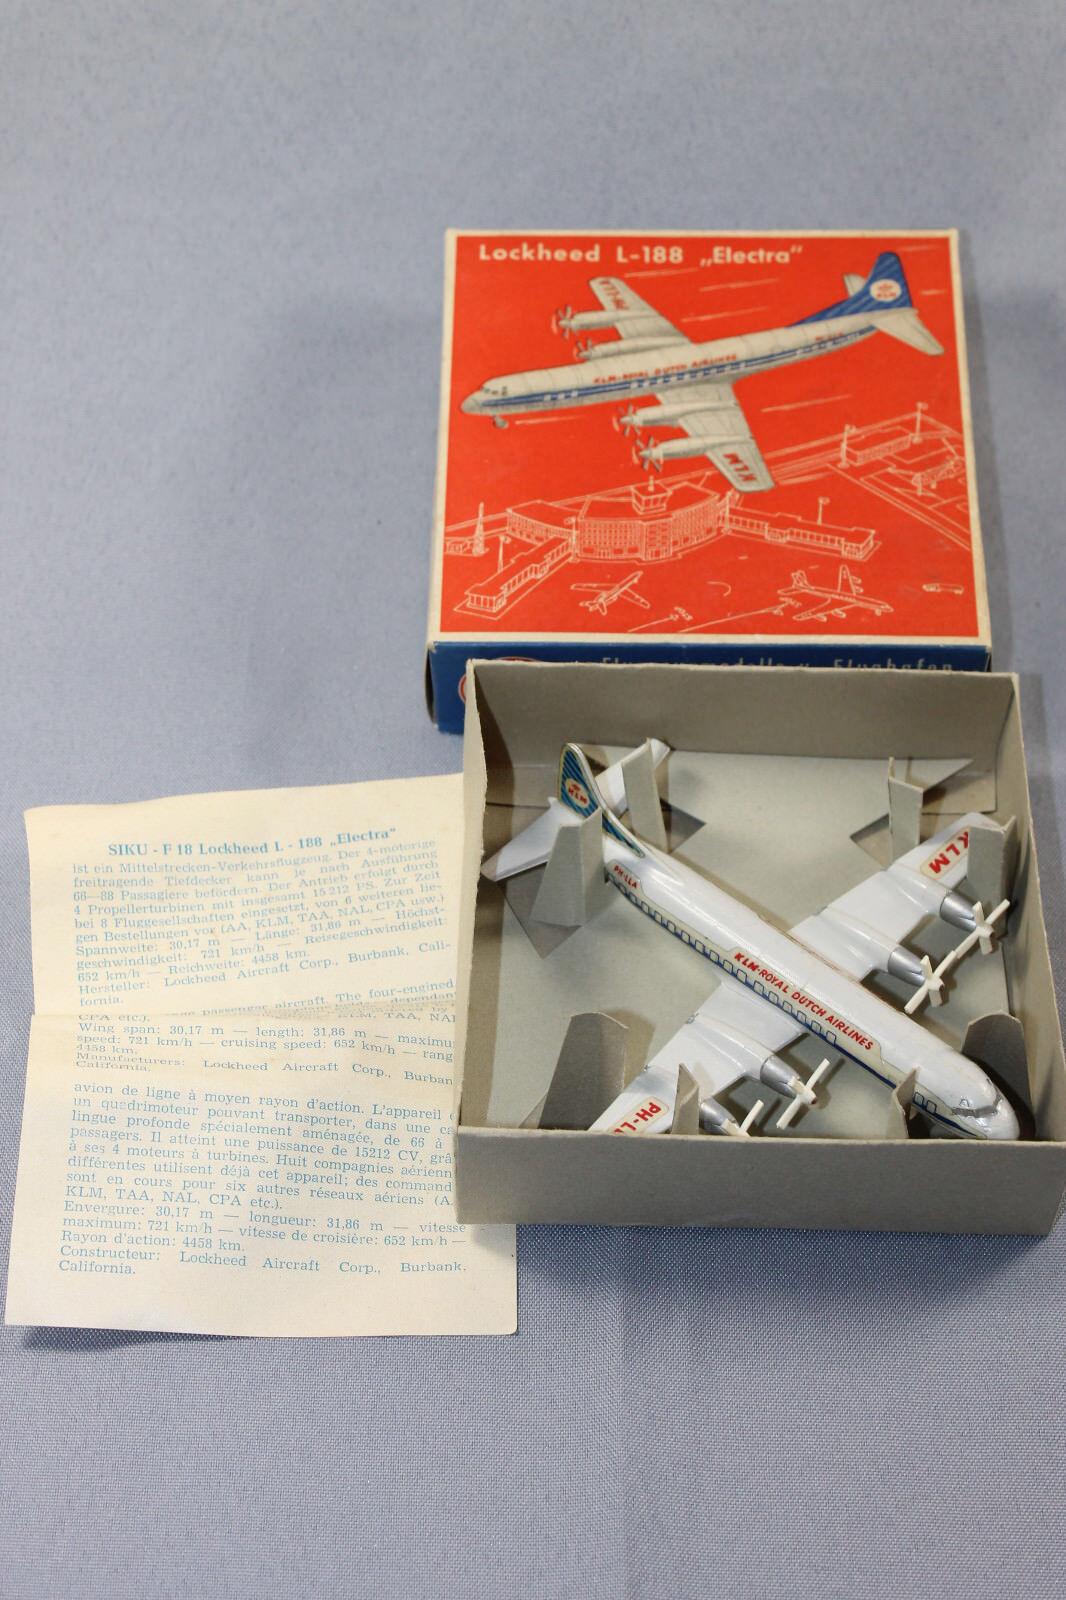 Siku PLASTICA f18 Lockheed l188 Electra in OVP aereo modellololo 1 250